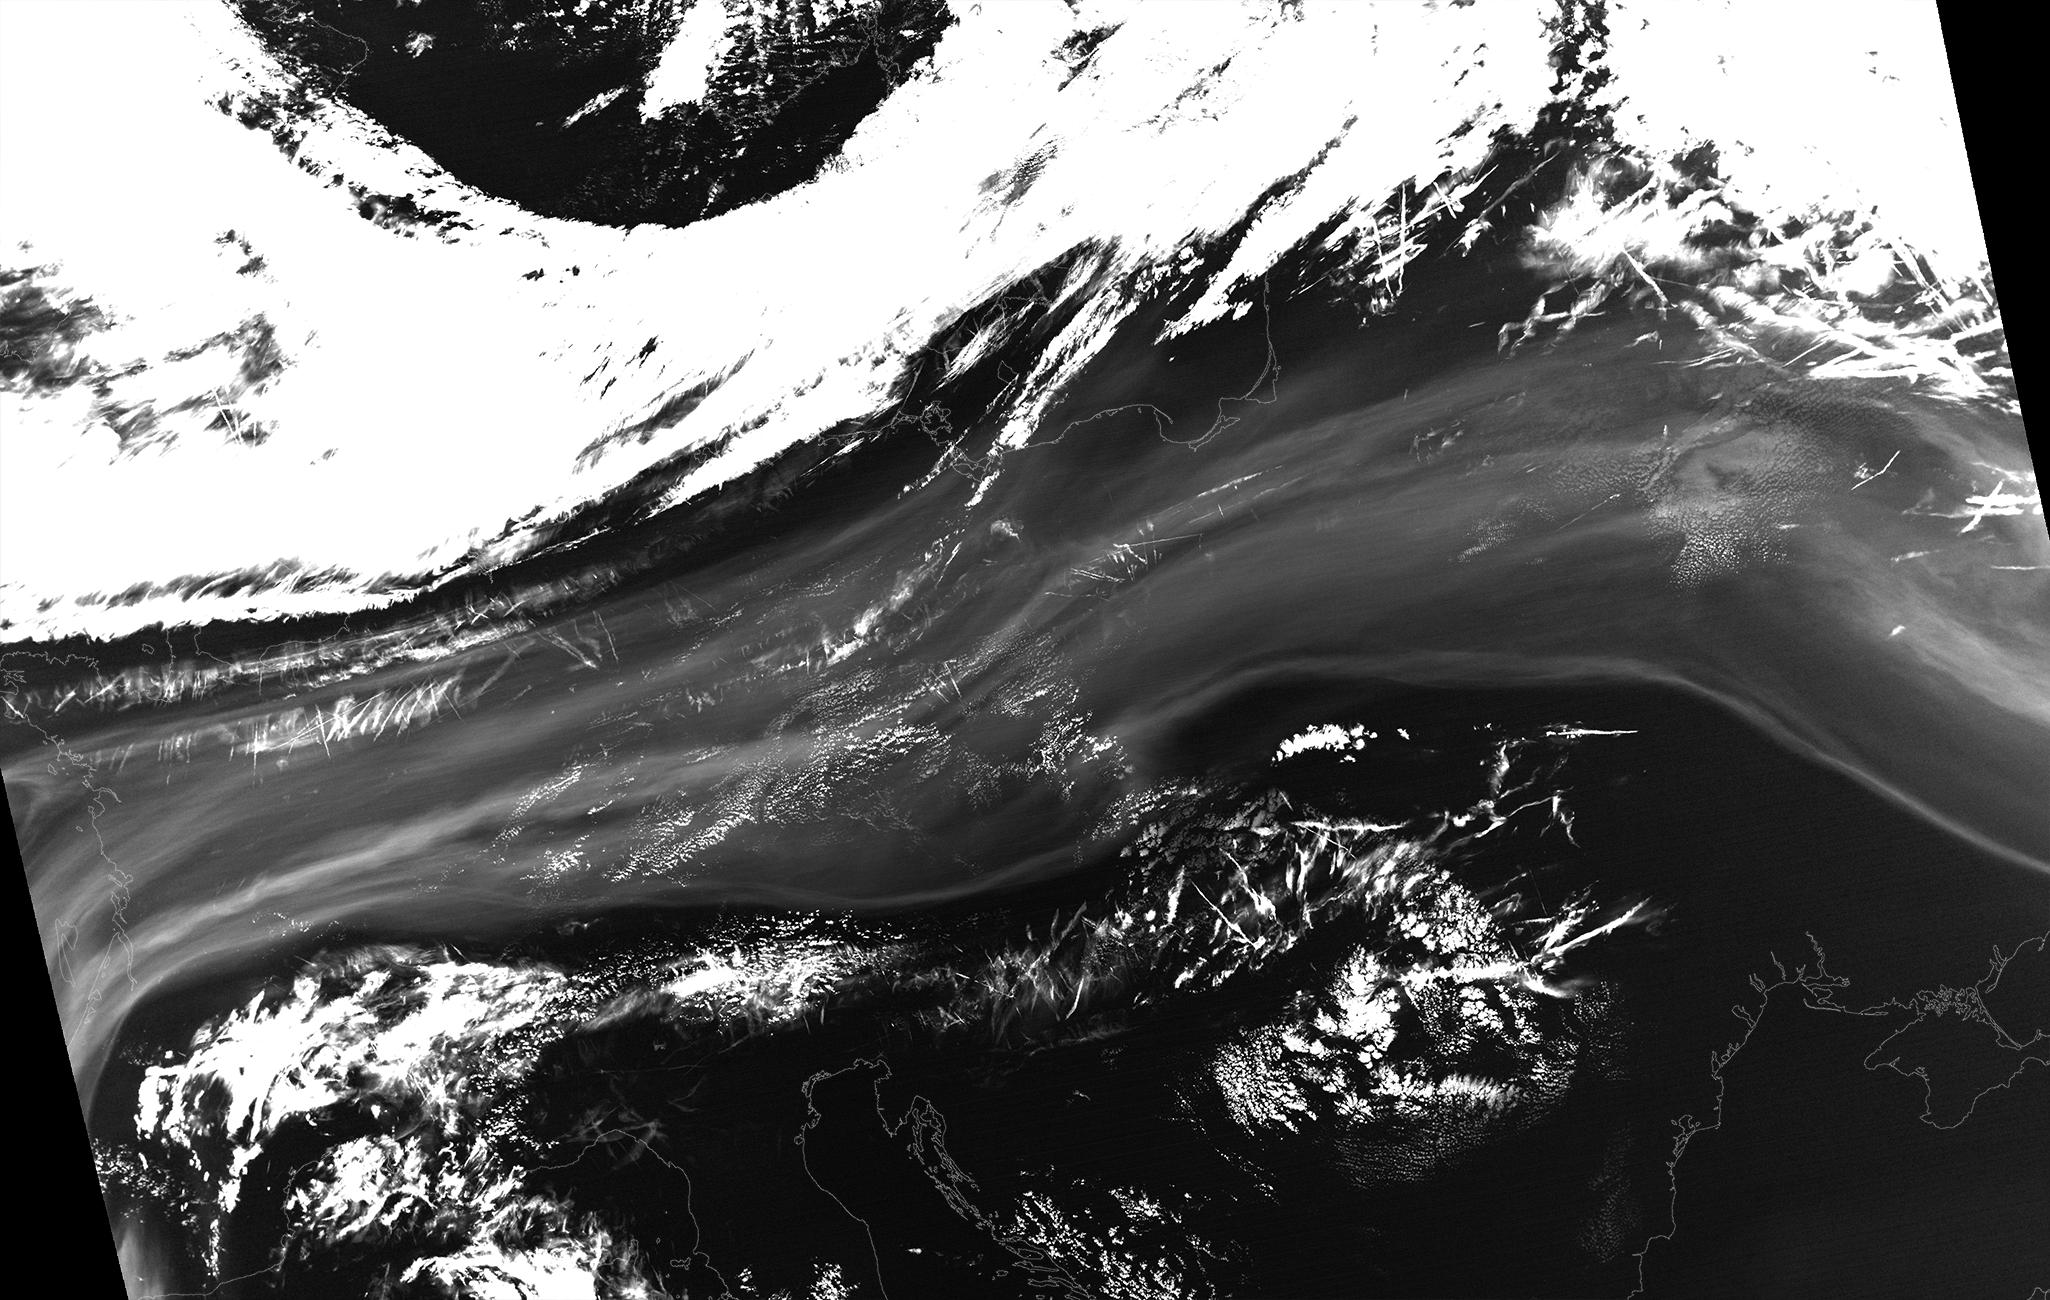 Figure 4: M9 reflectivity range from 0–1%